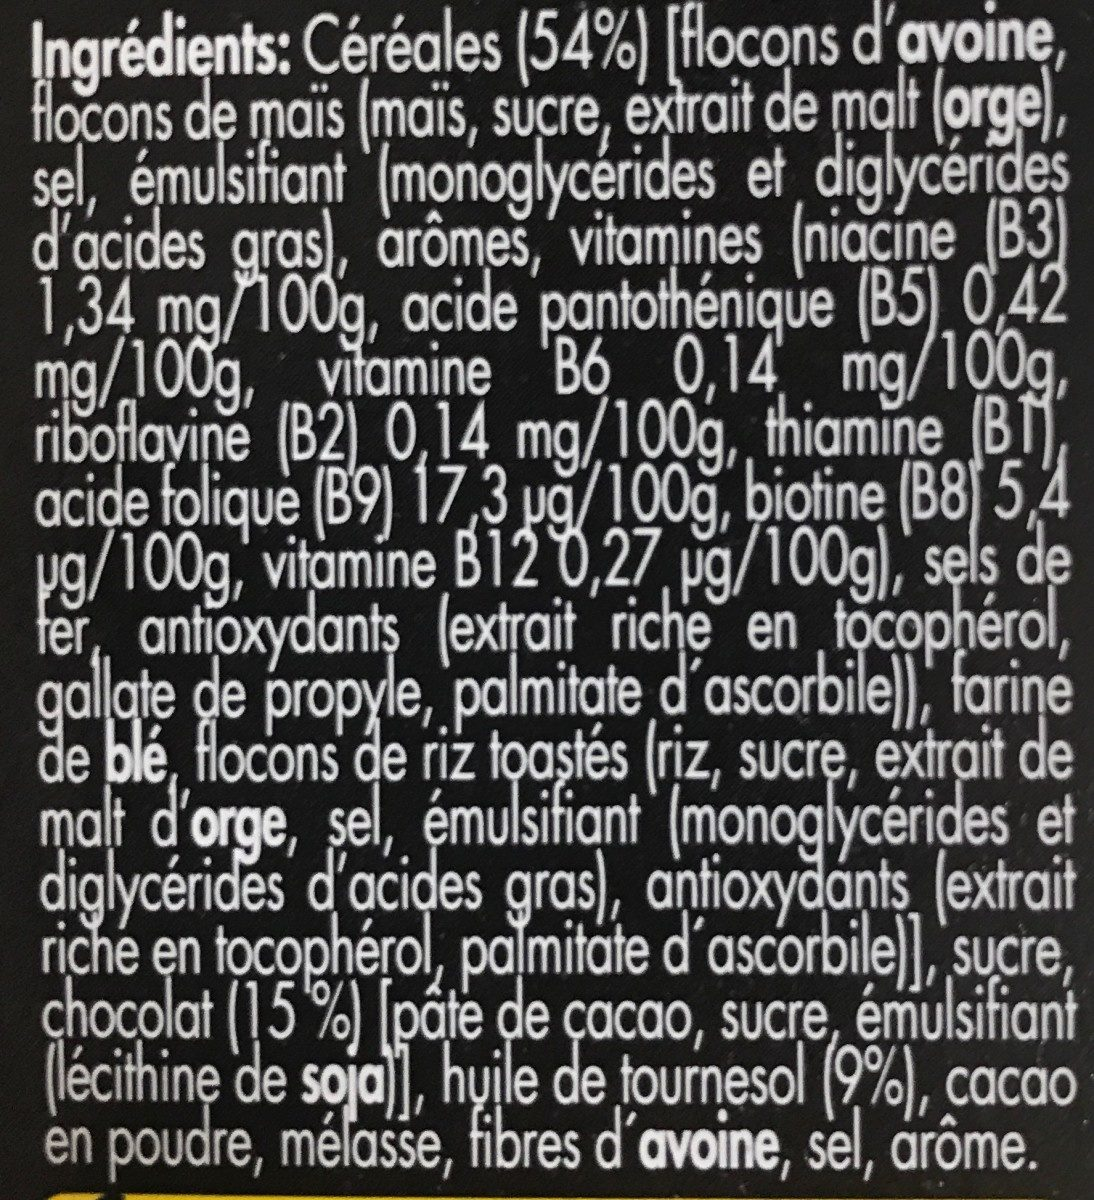 Crunchy Muesly Chocolate - Ingredients - fr